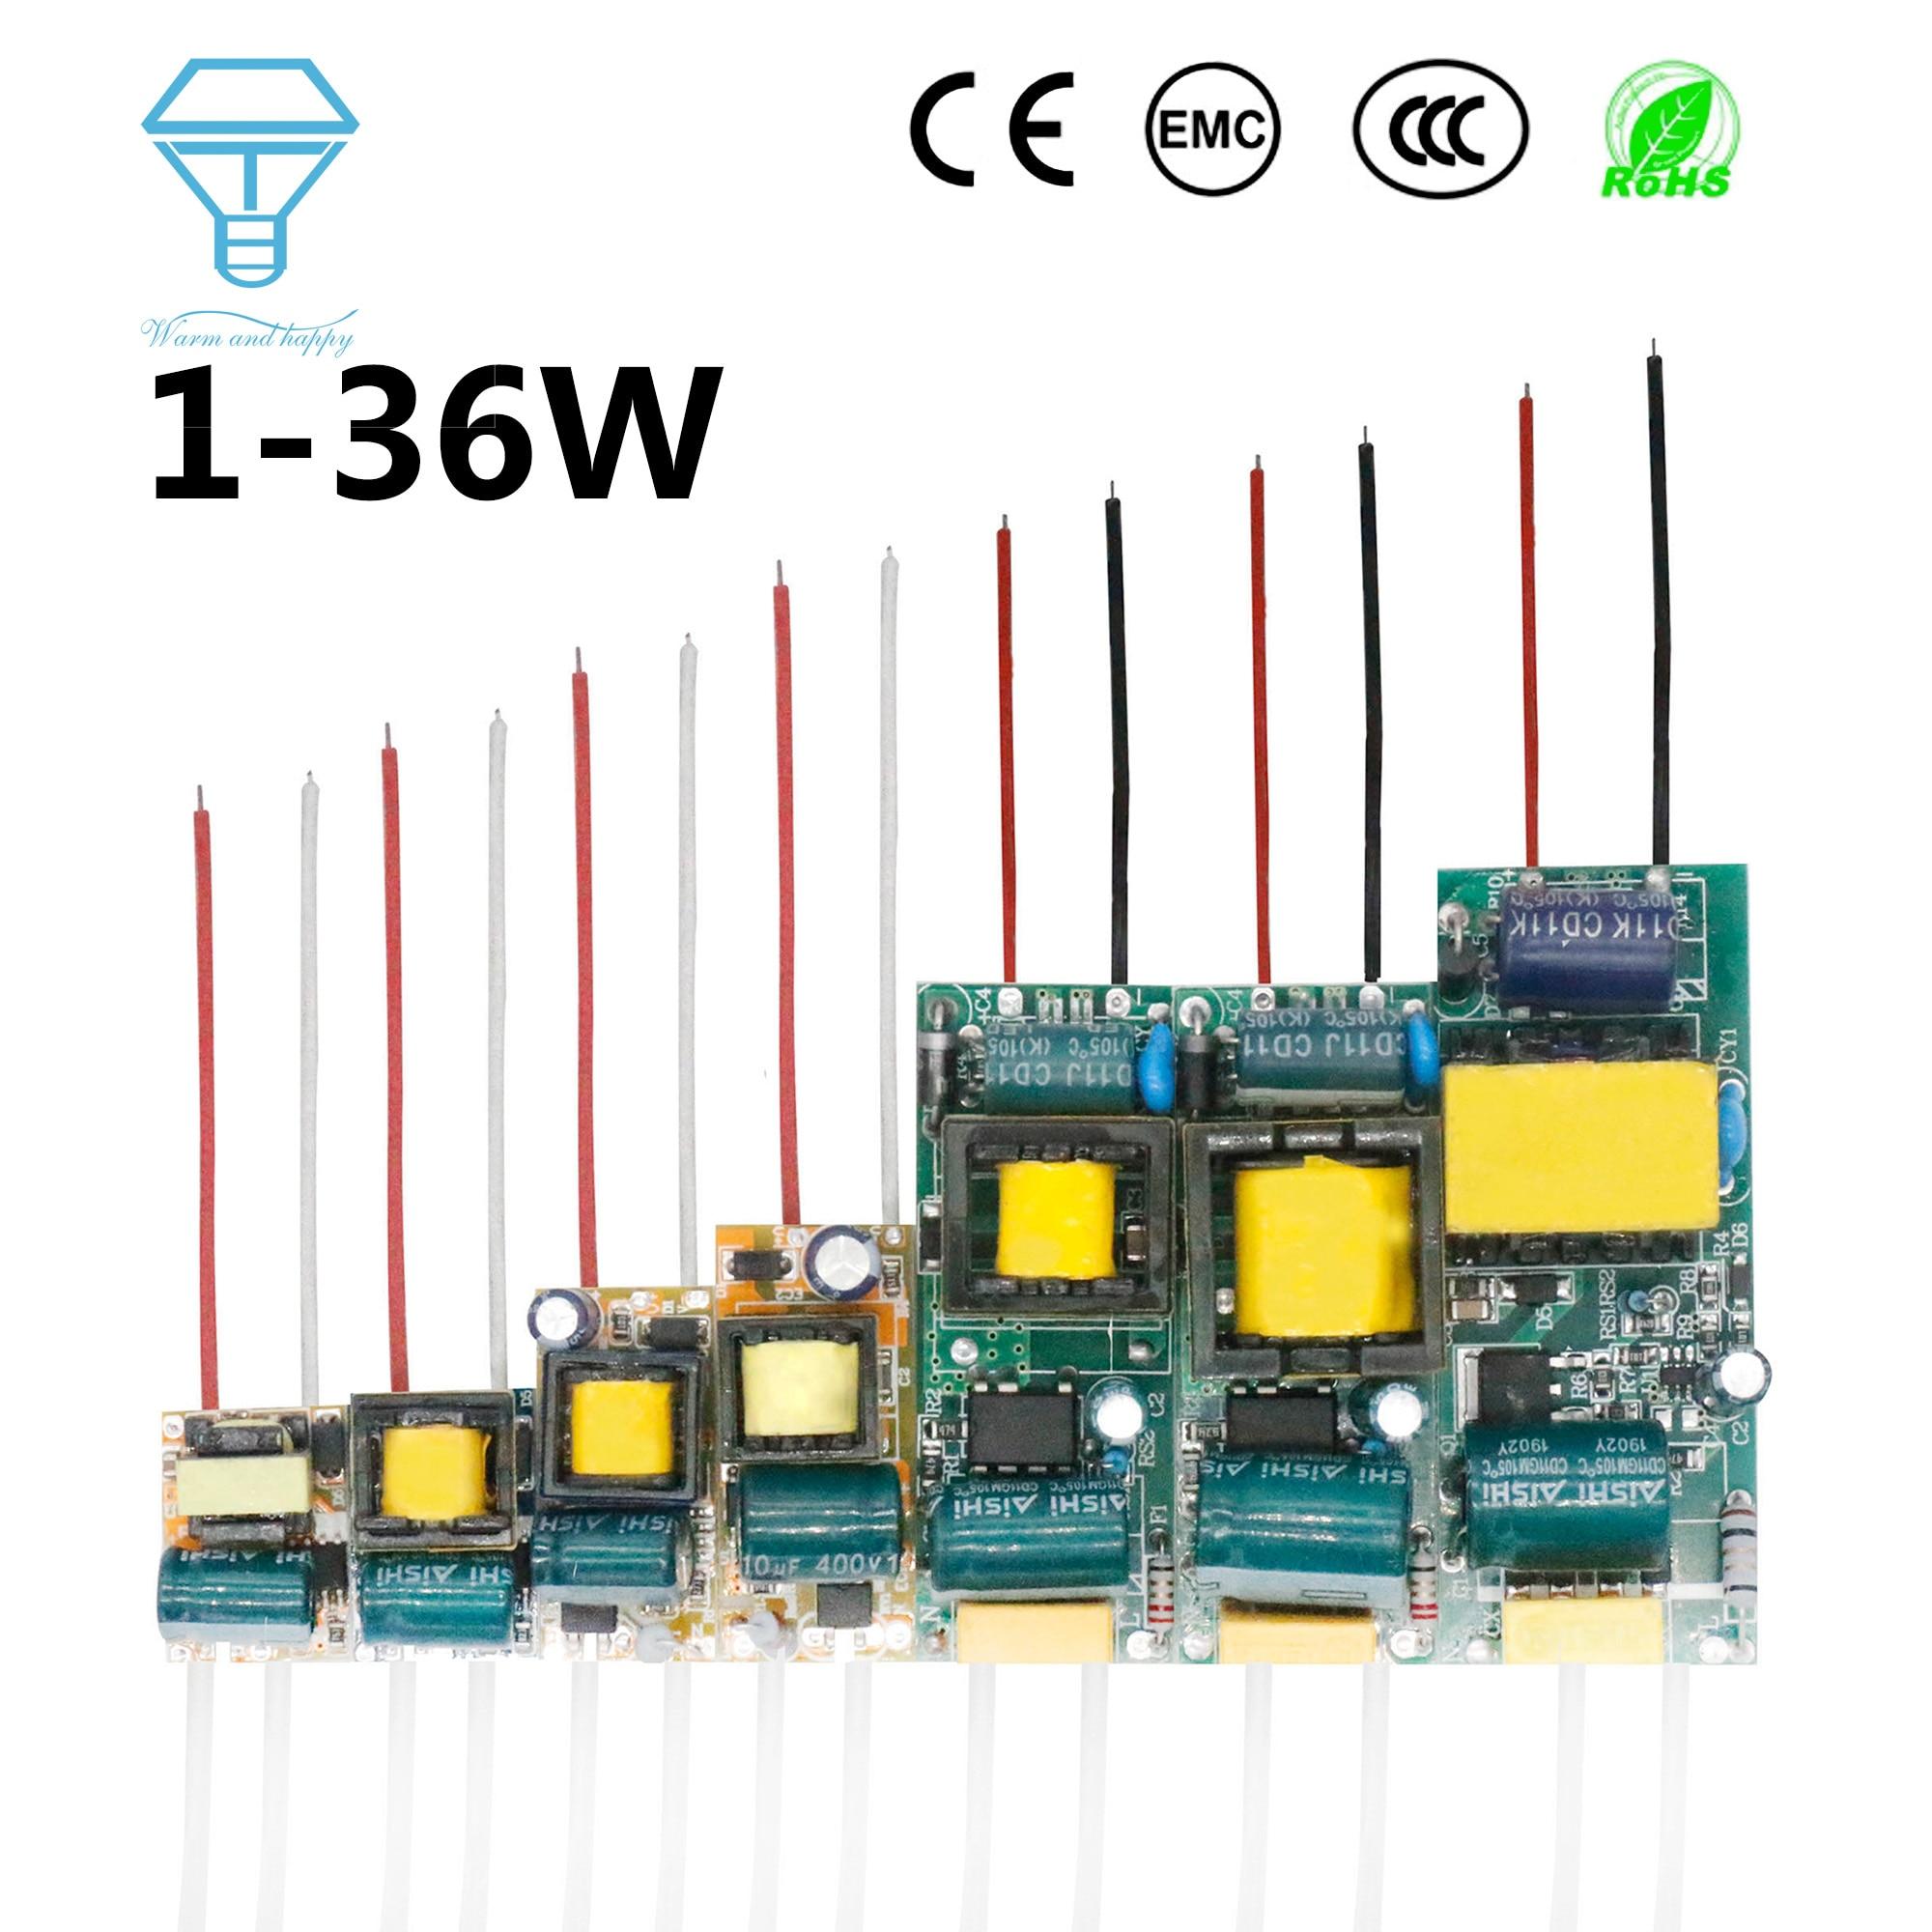 LED Driver 300mA 1-3W 3-5W 4-7W 8-12W 12-18W 18-25W 25-36W LED Power Supply Unit 350mA AC90-265V Lighting Transformers For LEDs